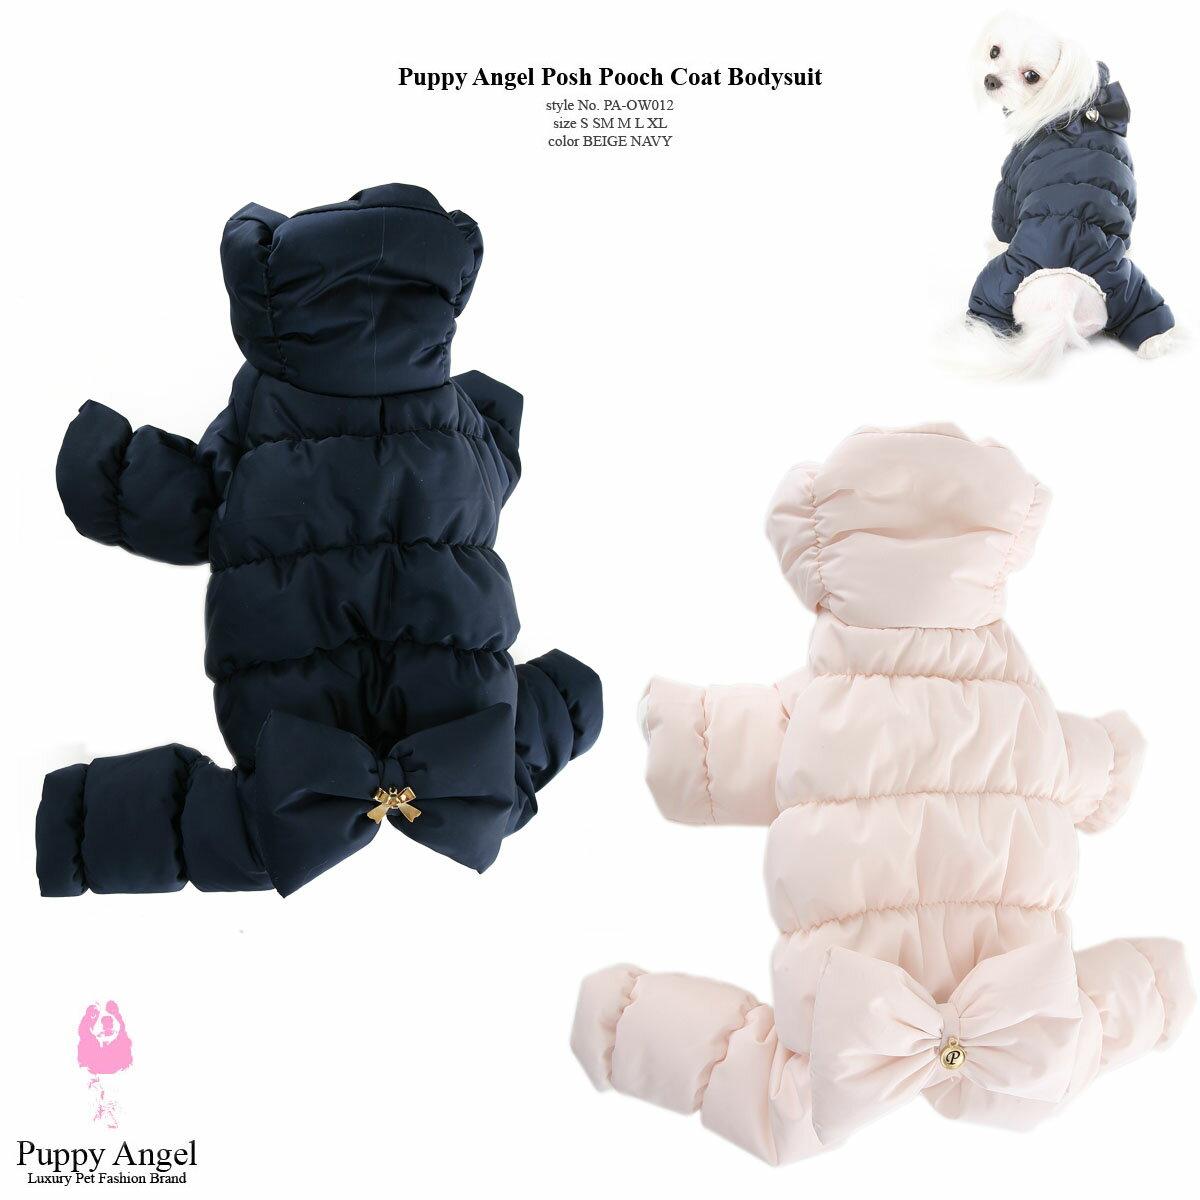 Puppy Angel Posh Pooch Coat Bodysuit S~XLサイズ 送料無料 PUPPYANGEL パピーエンジェル 犬 服 洋服 犬服 犬の服 犬の洋服 ドッグウェア 犬用